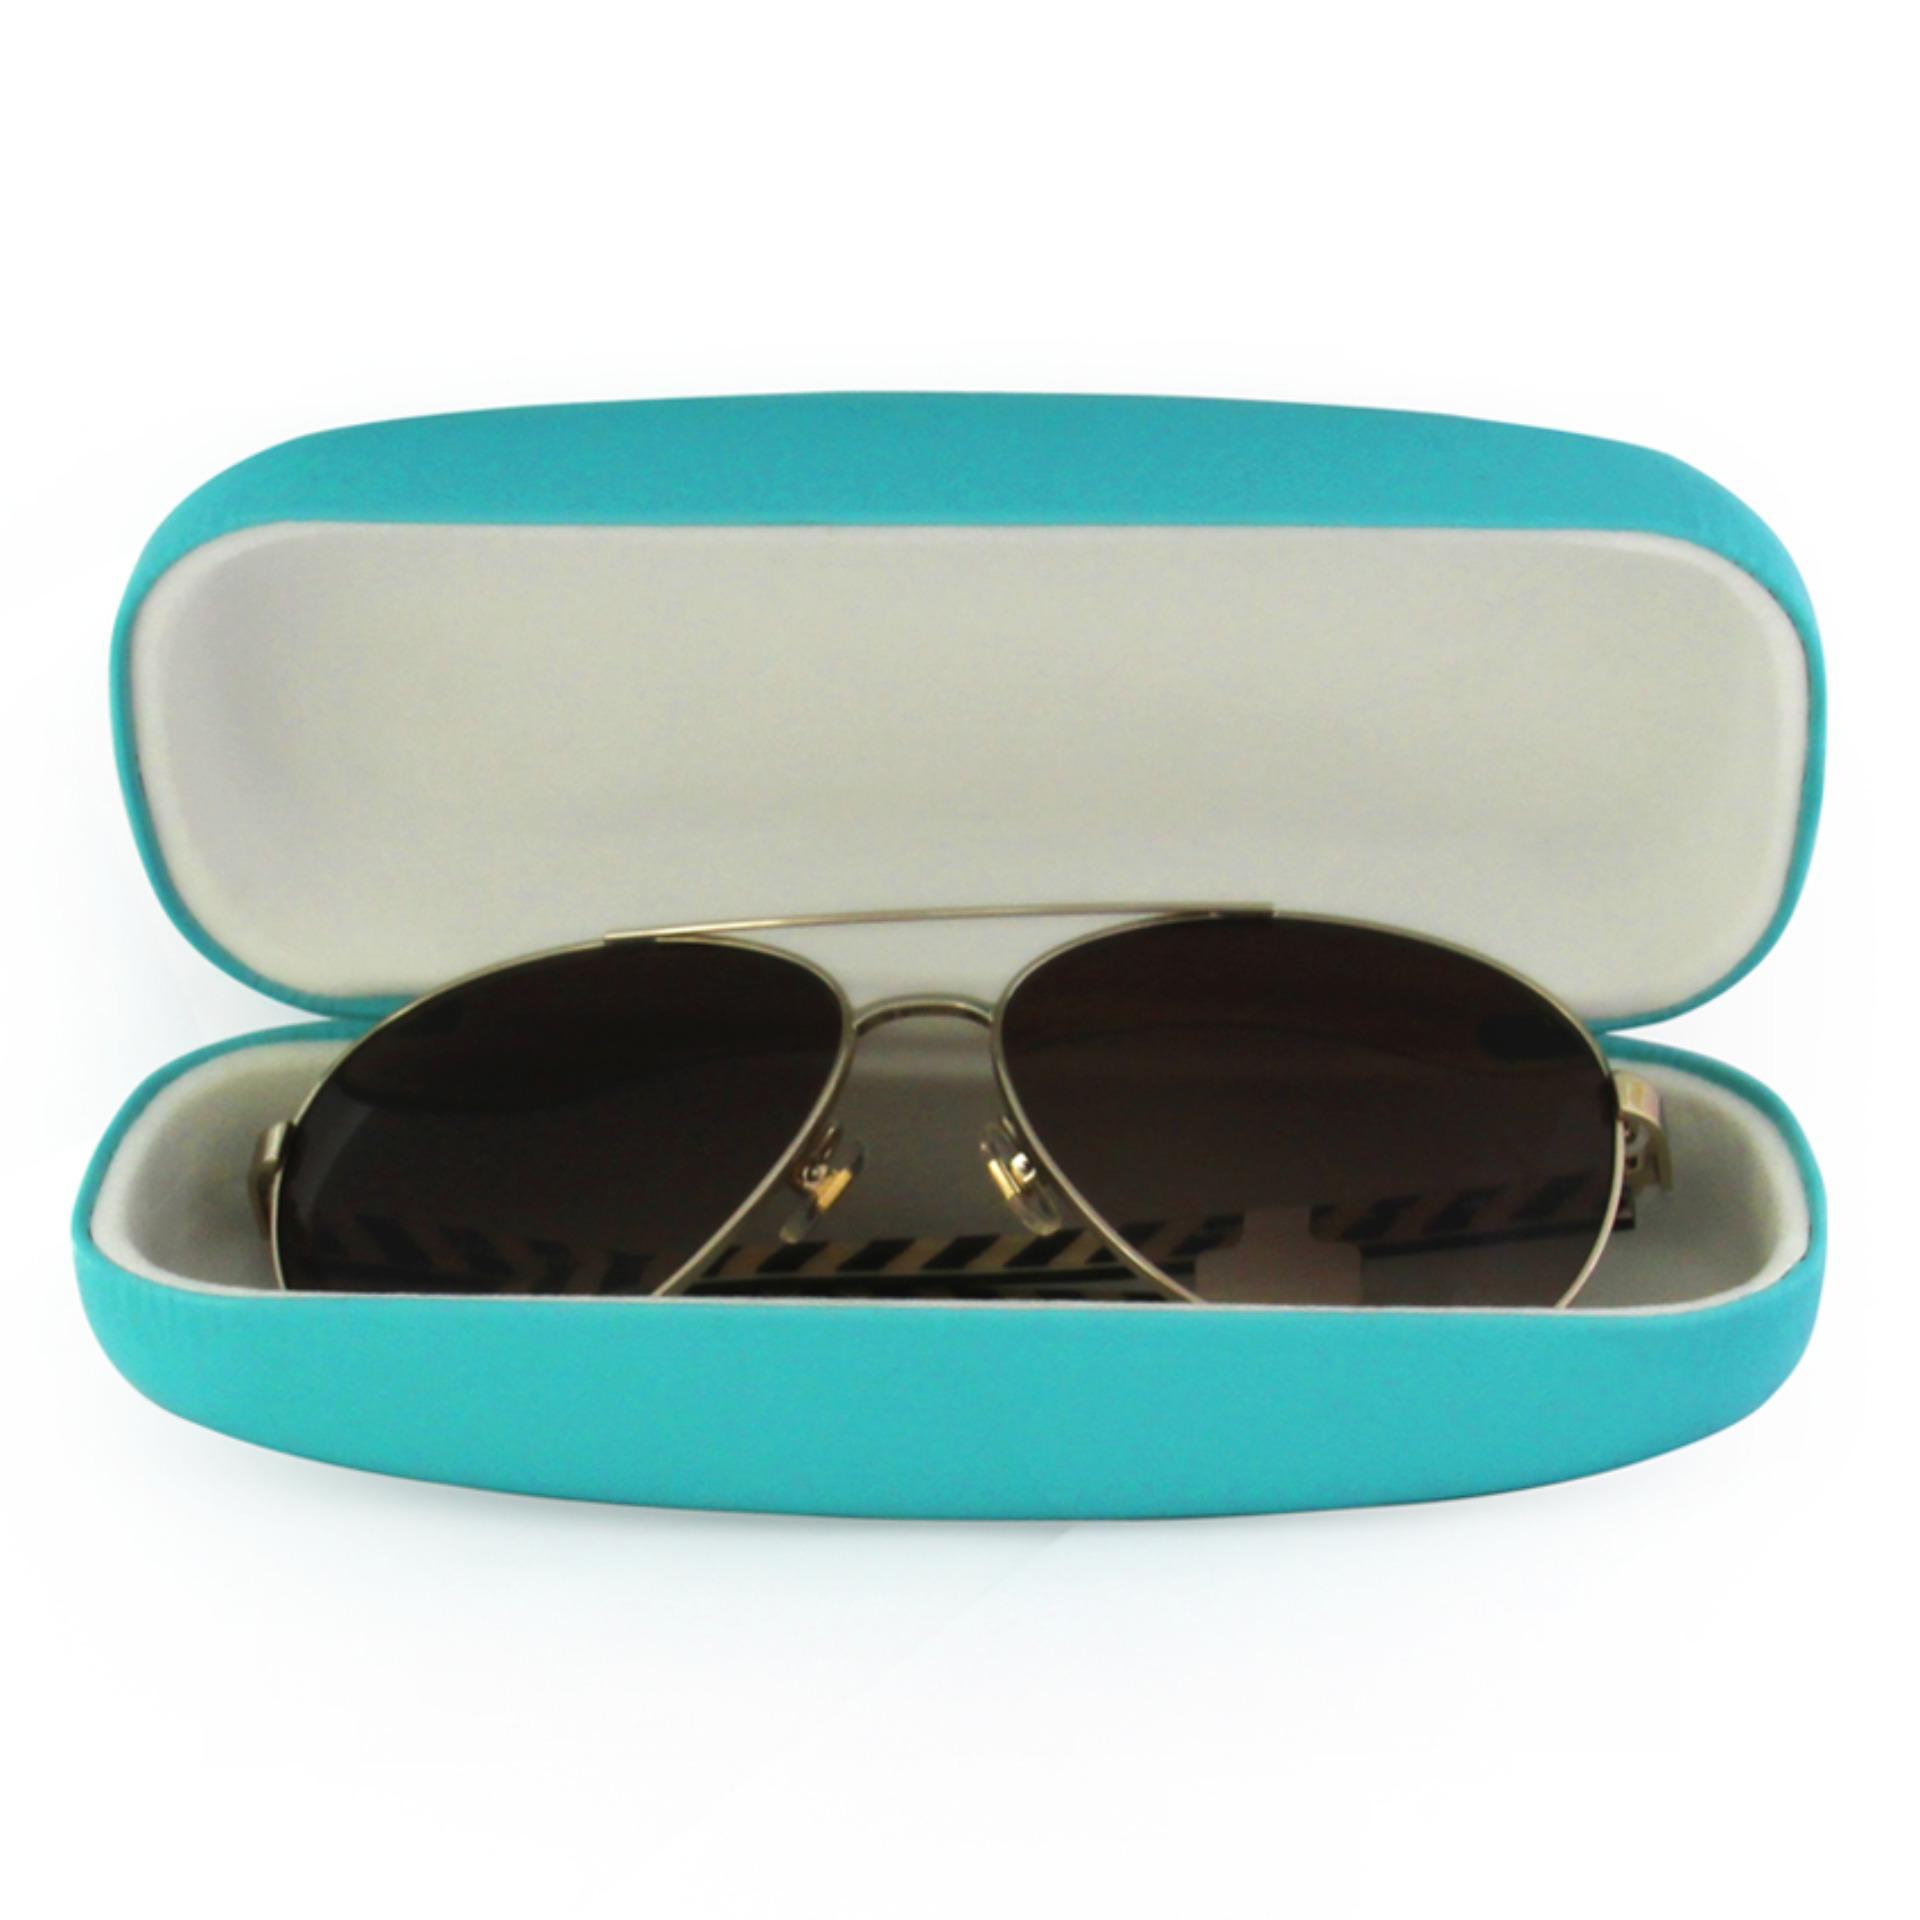 ... Kate Spade Sunglasses 03YGY6 BLOSSOM - Kacamata wanita ...